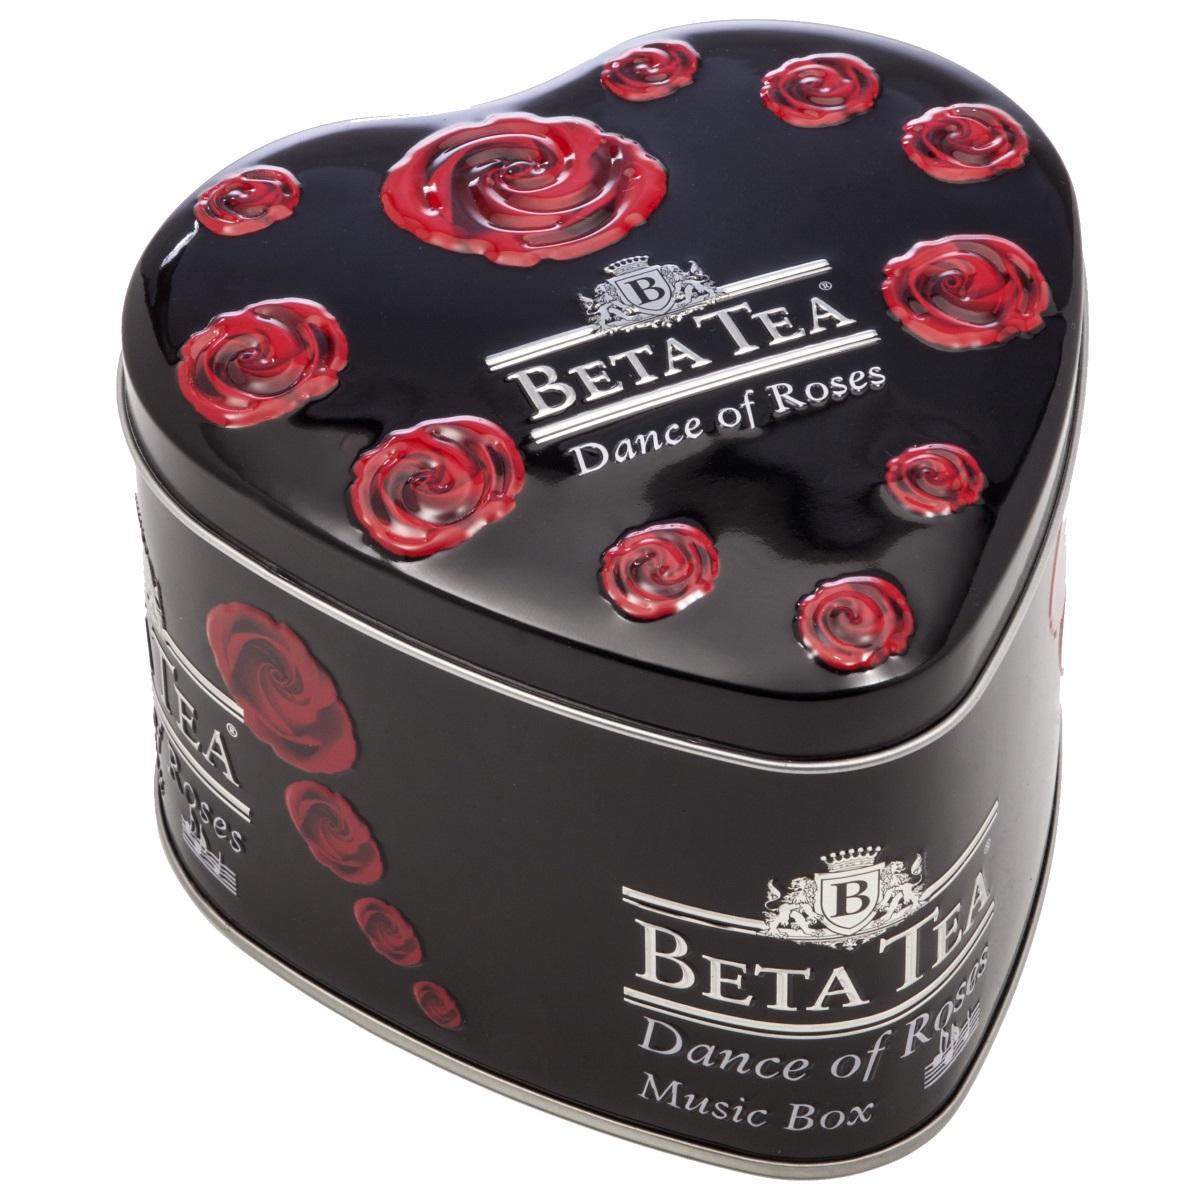 Beta Tea Танец роз черный чай, 100 г (музыкальная шкатулка) валерий хатюшин история сердца любовная проза